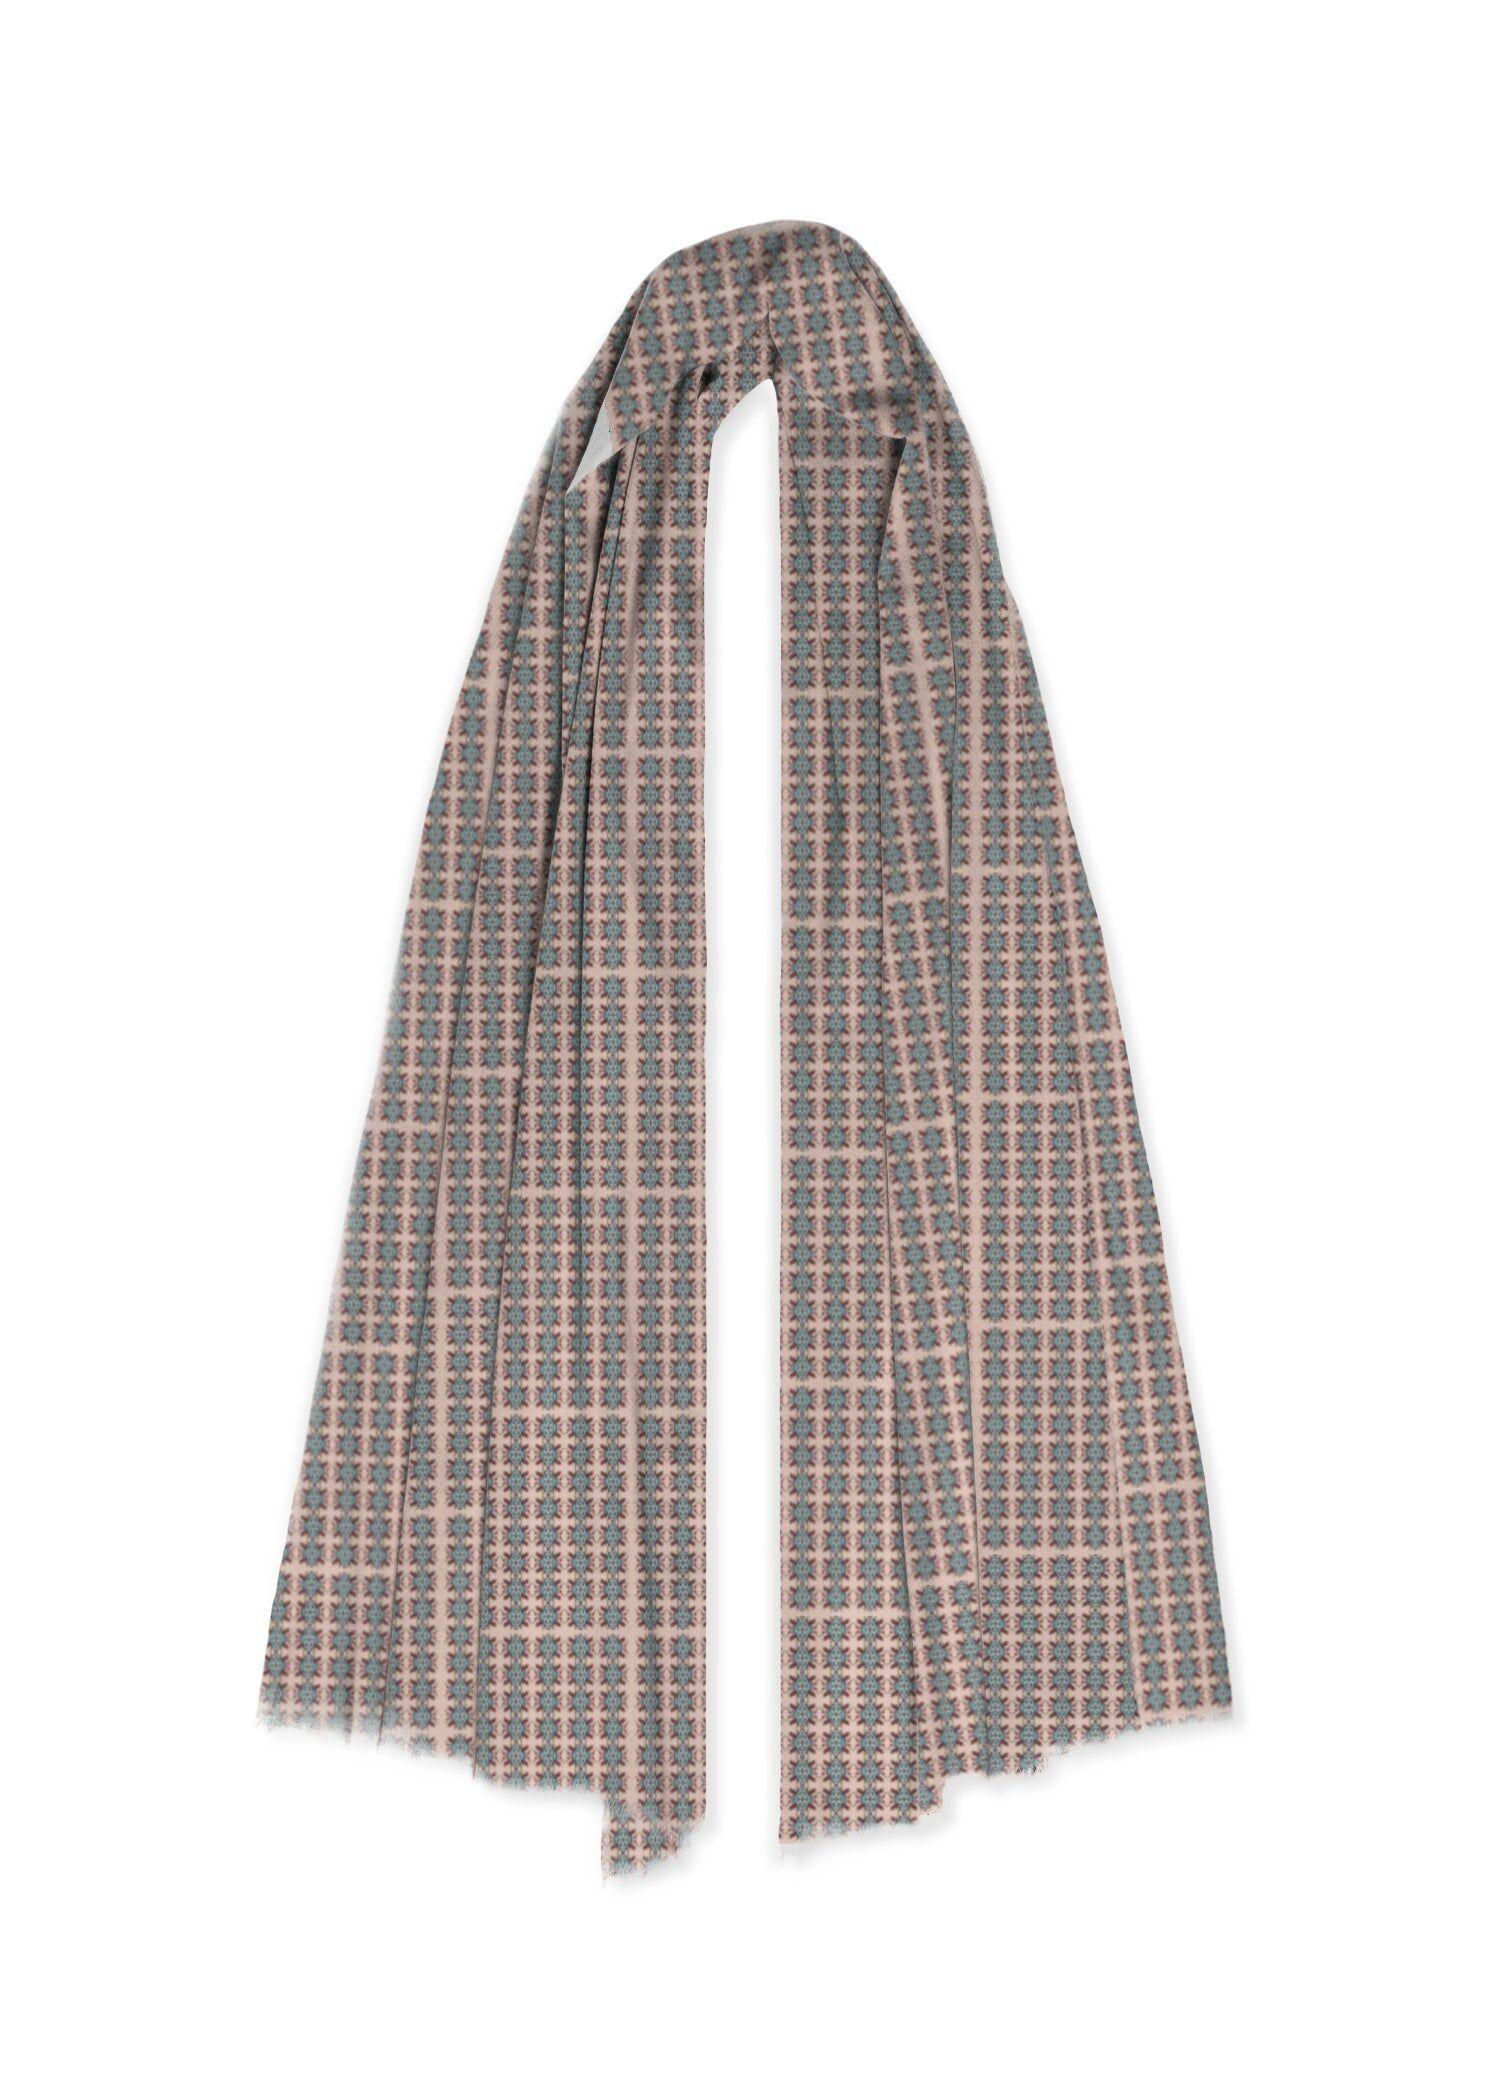 VIDA 100% Cashmere Scarf - Old Fashion by VIDA Original Artist  - Size: One Size